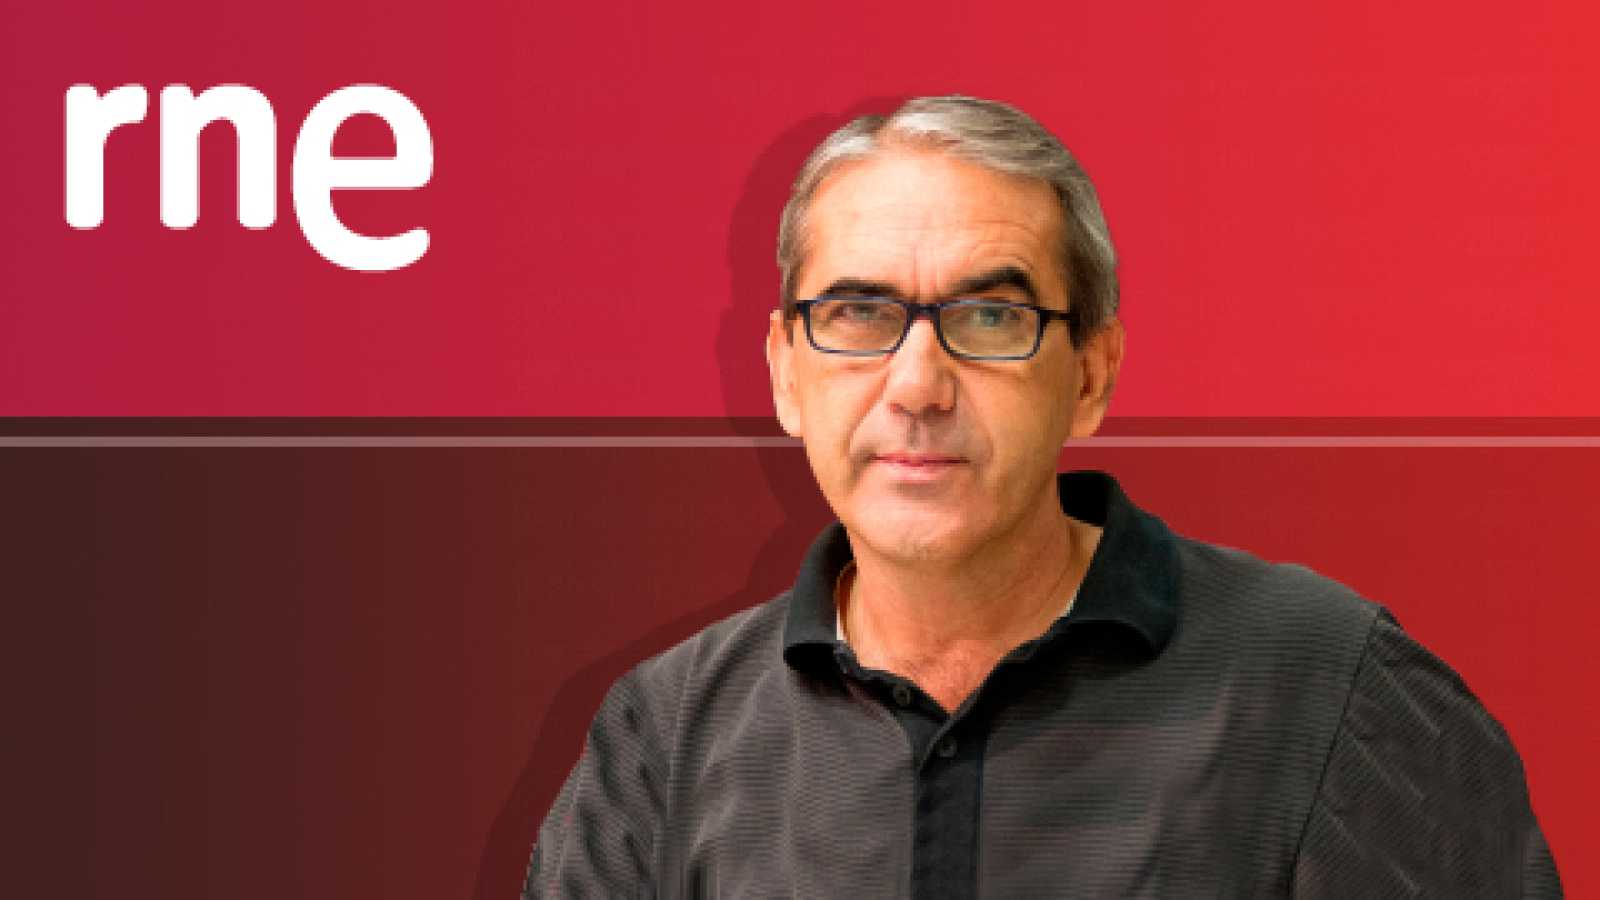 Historias de papel 31/01/21 - Mónica Gutiérrez, Miguel Ángel Asturias, Vasilli Grossman - Escuchar ahora